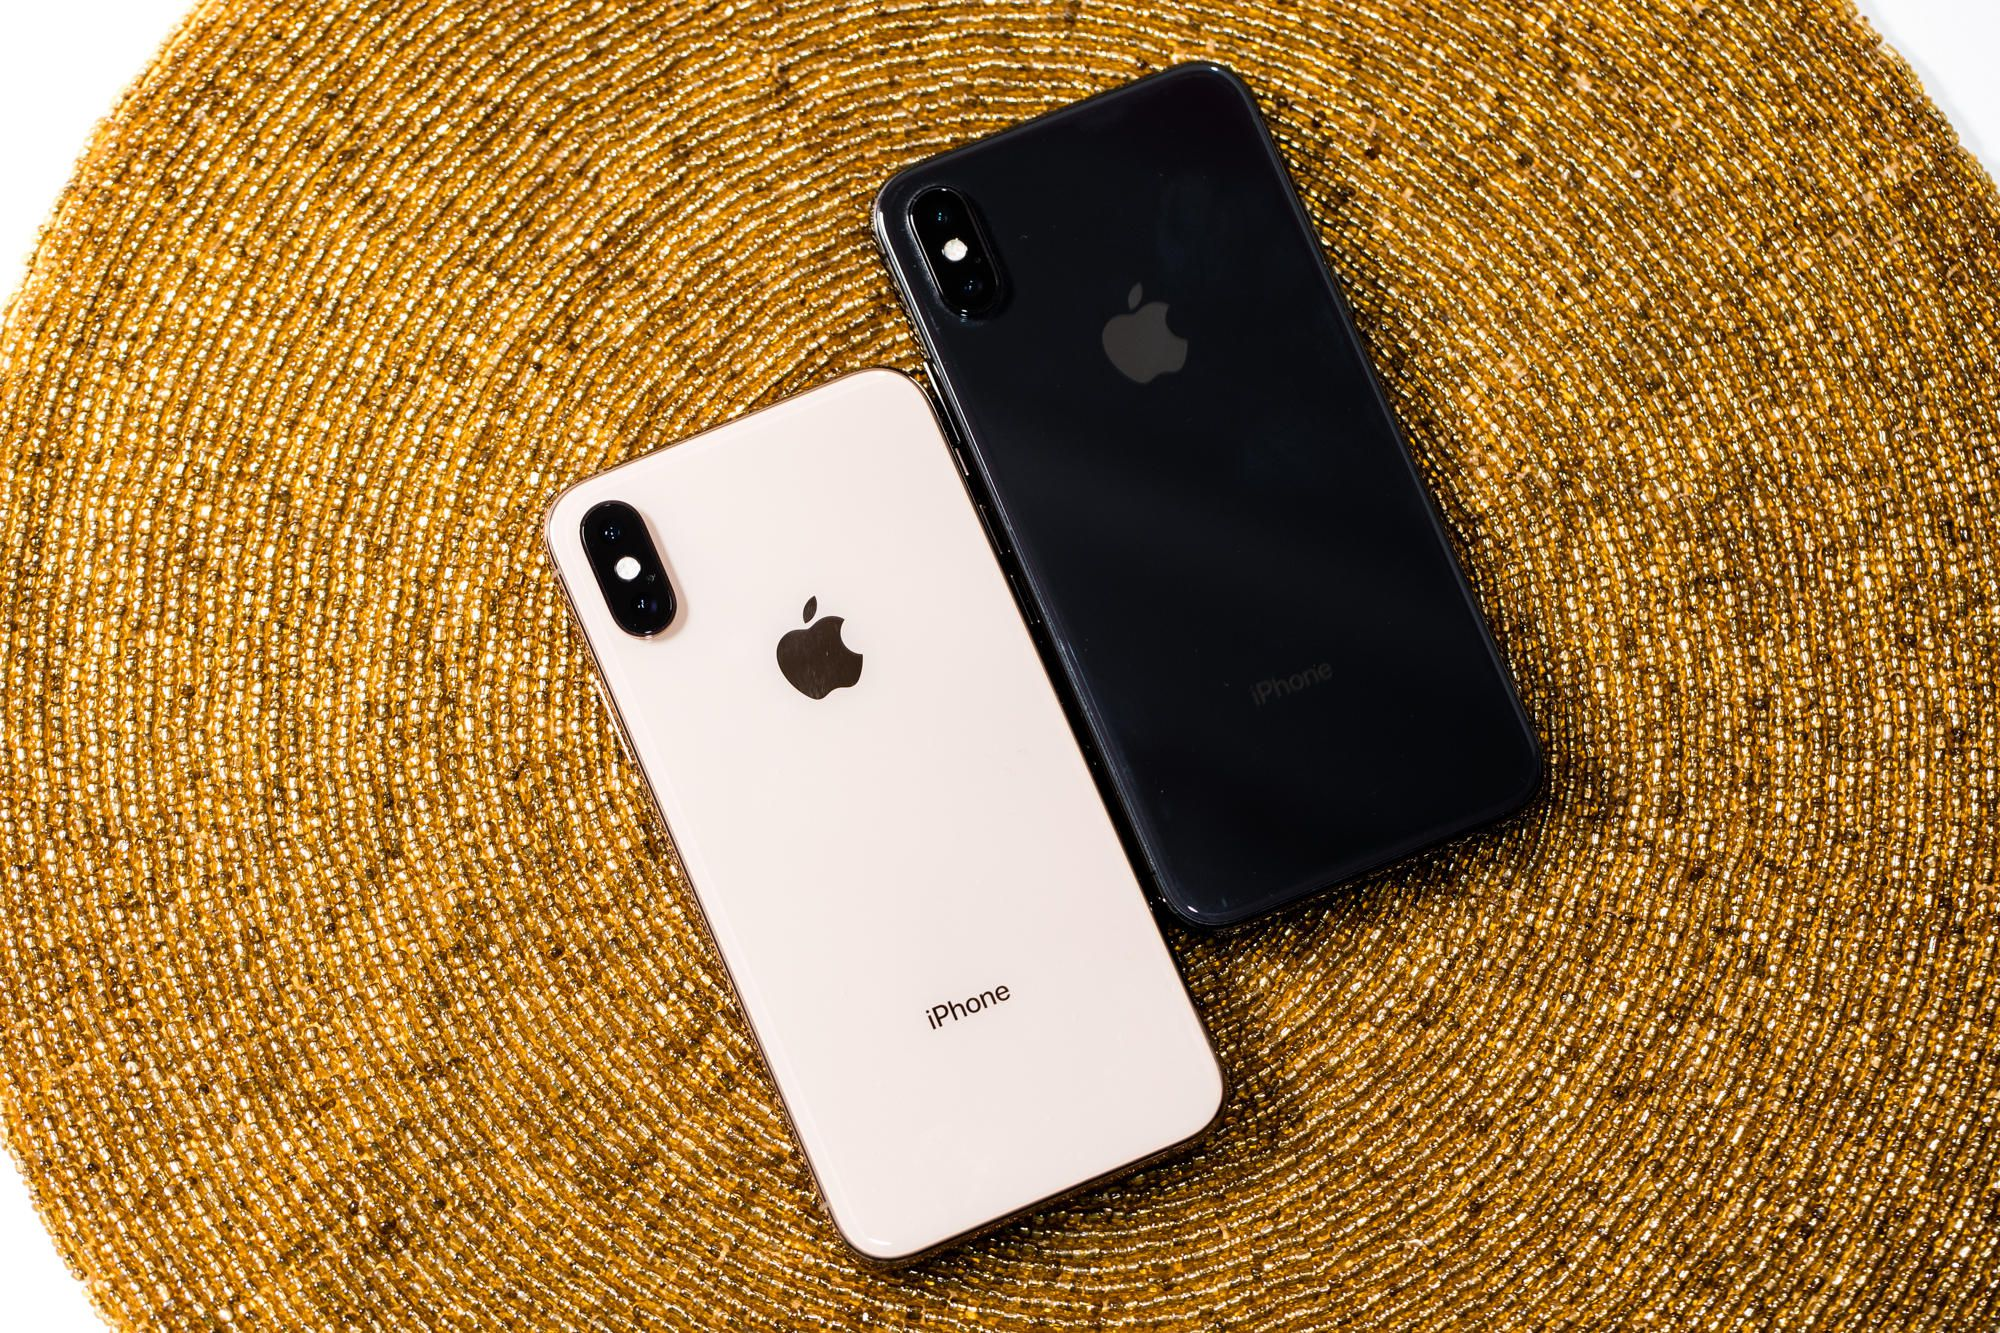 iPhone XS & iPhone X, iPhone XS Camera iPhone X Camera, iPhone XS Camera Vs iPhone X Camera,iPhone XS Vs iPhone X Speed, iPhone XS Camera, iPhone X Cam